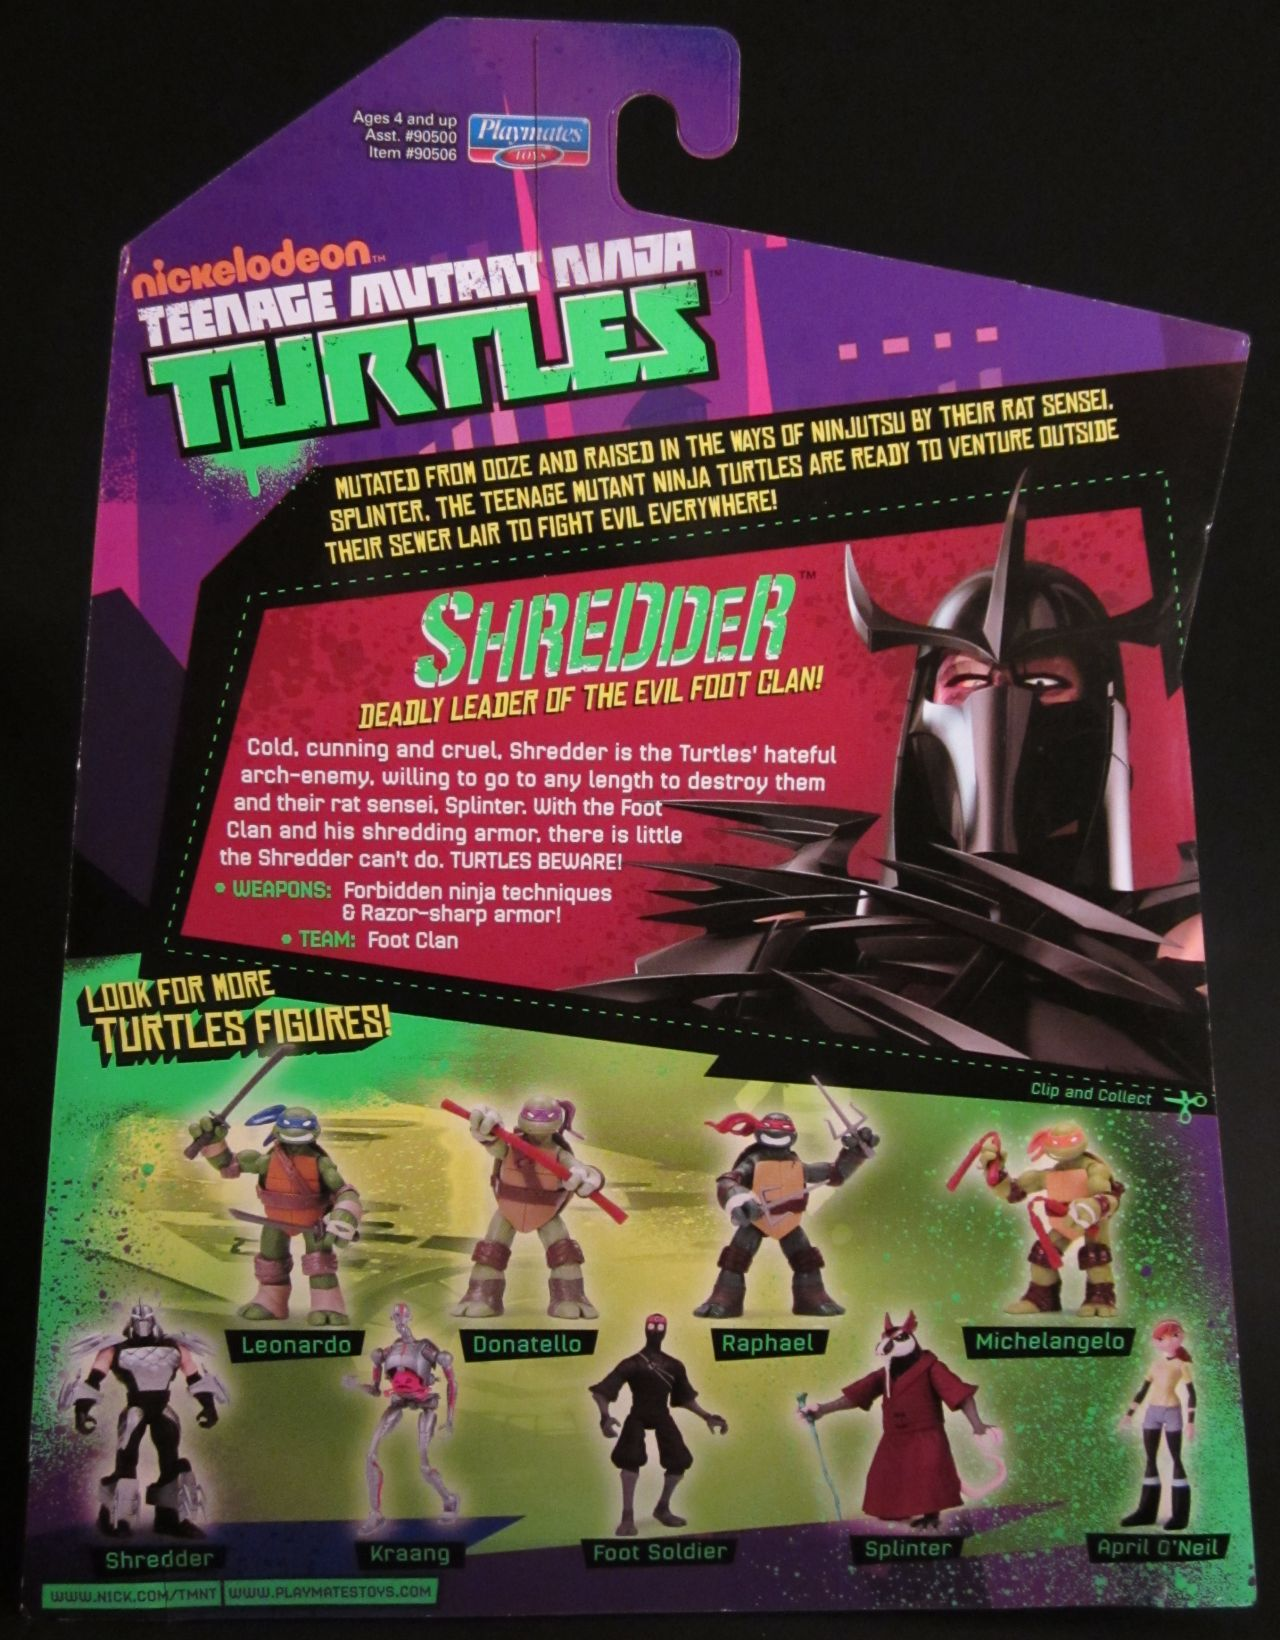 Nickelodeon S Teenage Mutant Ninja Turtles Shredder A Nerd